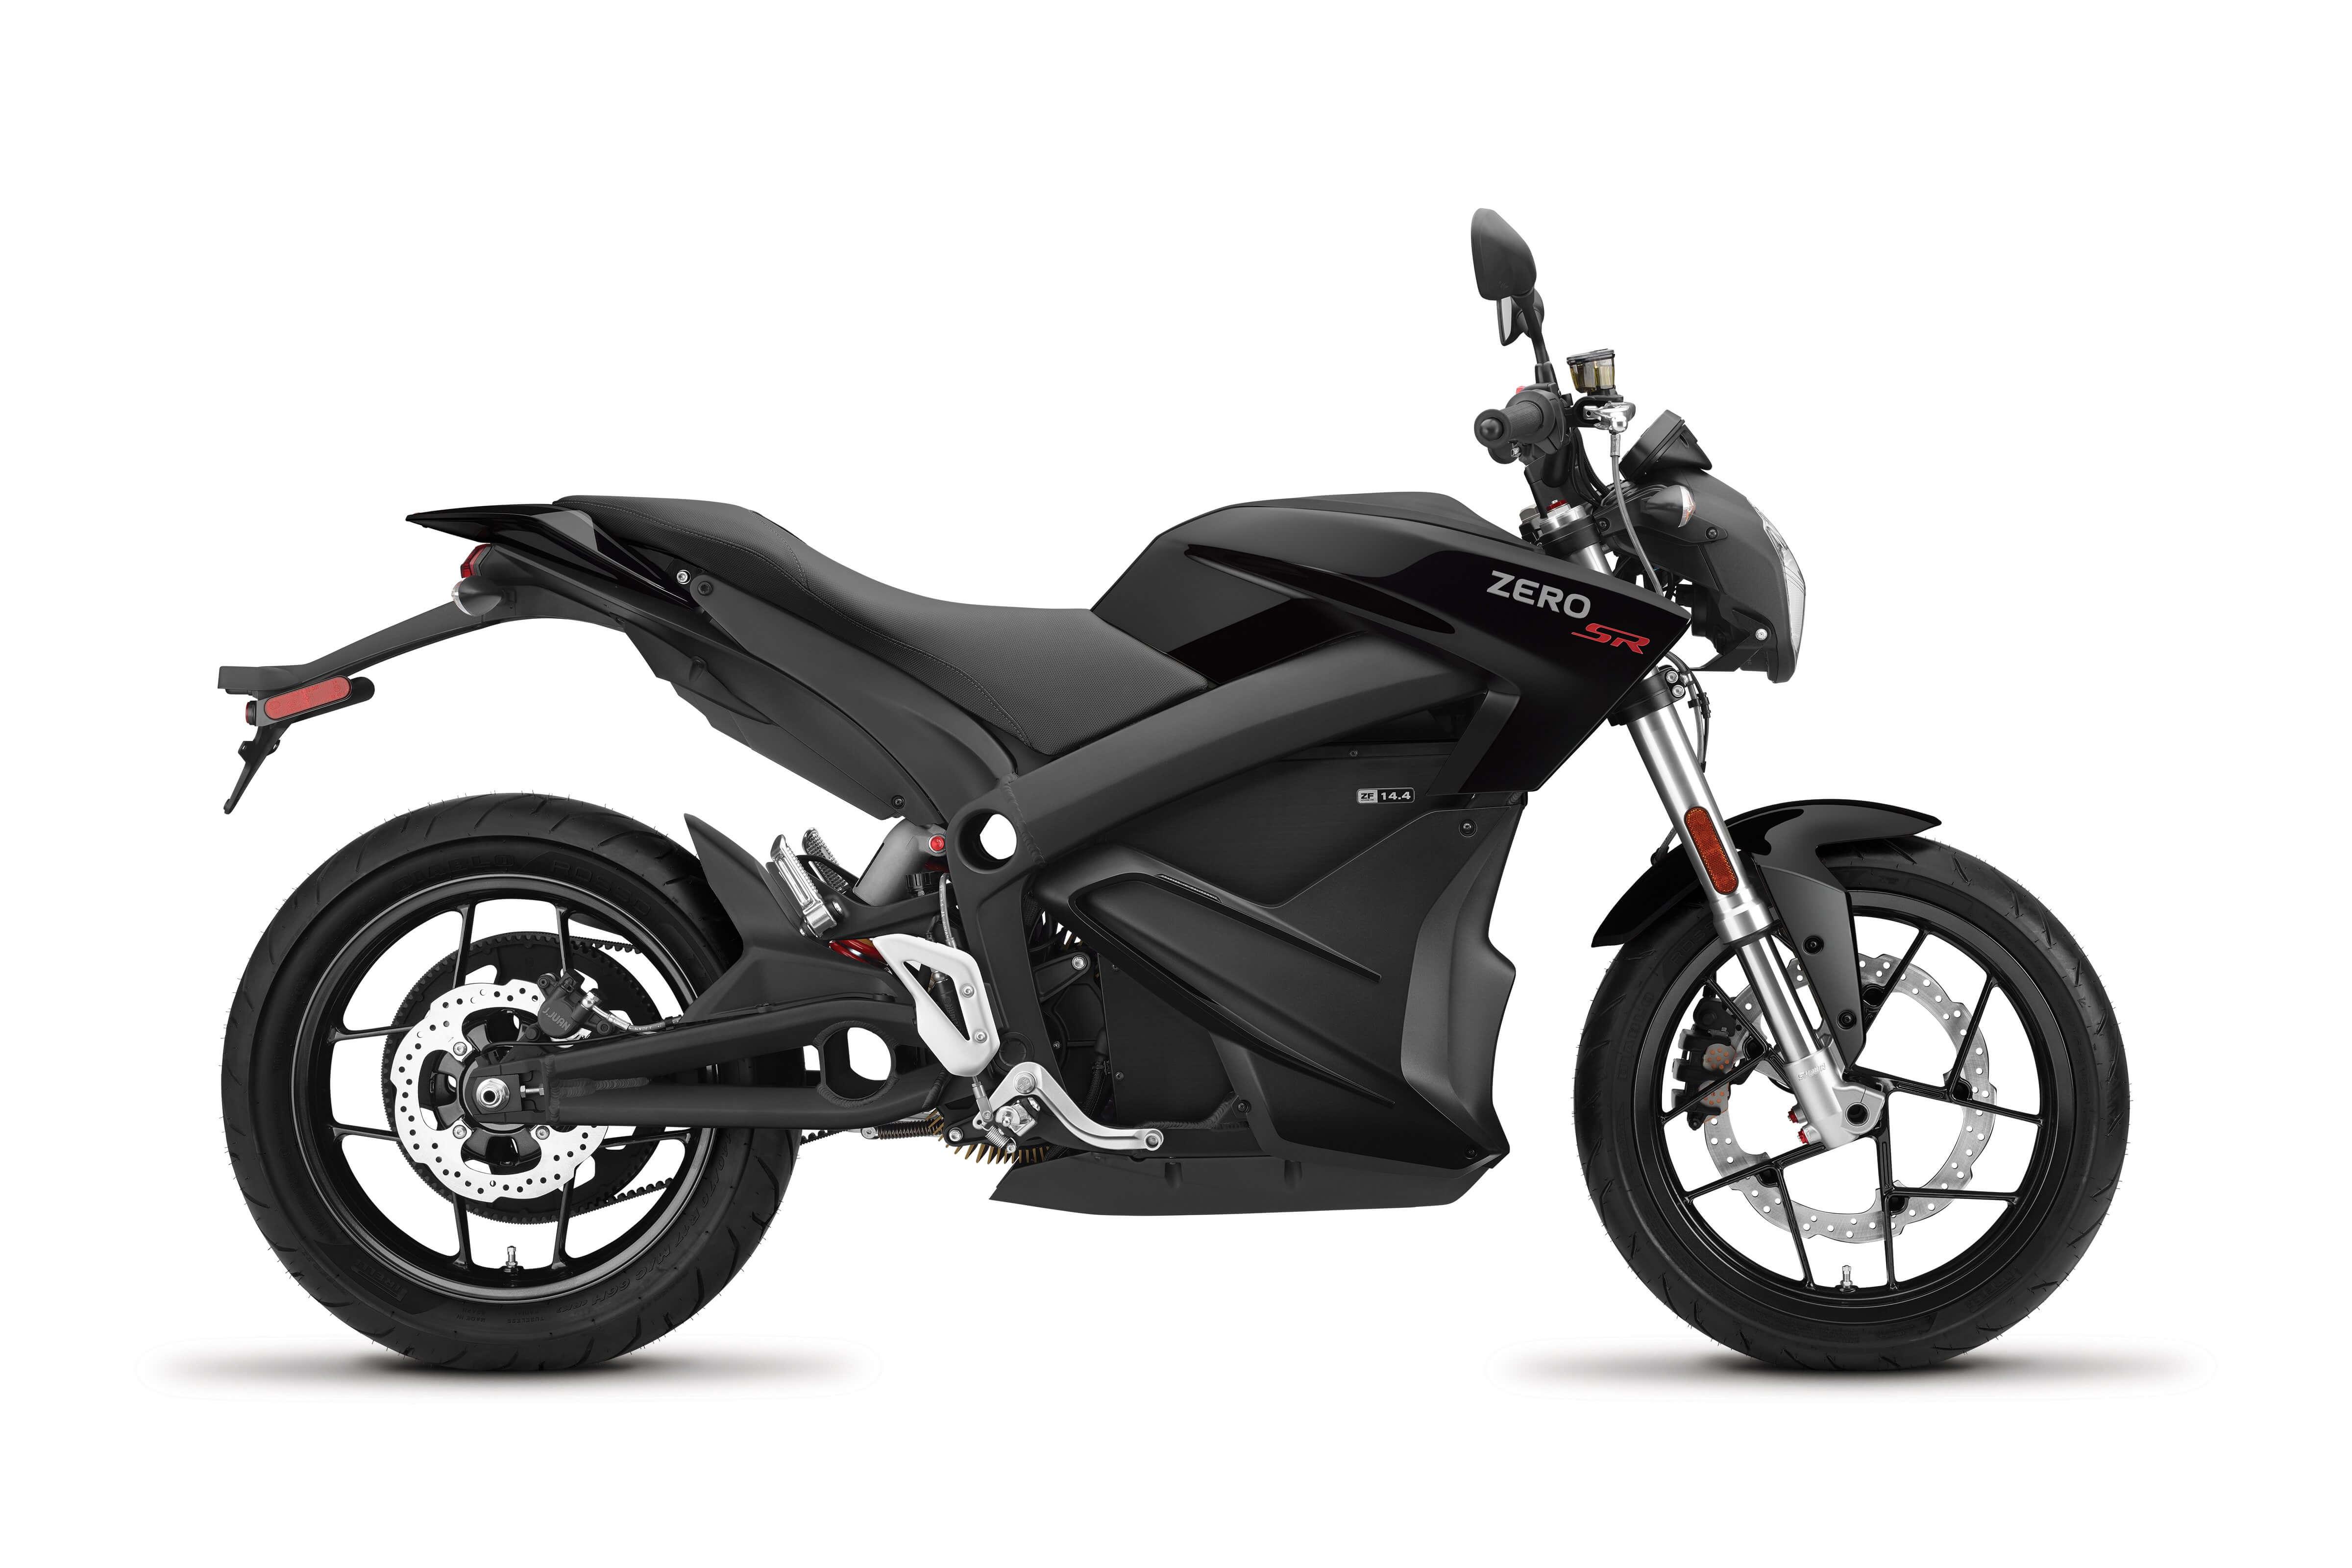 Moto eléctrica Zero SR ZF 14.4 (MY2019)